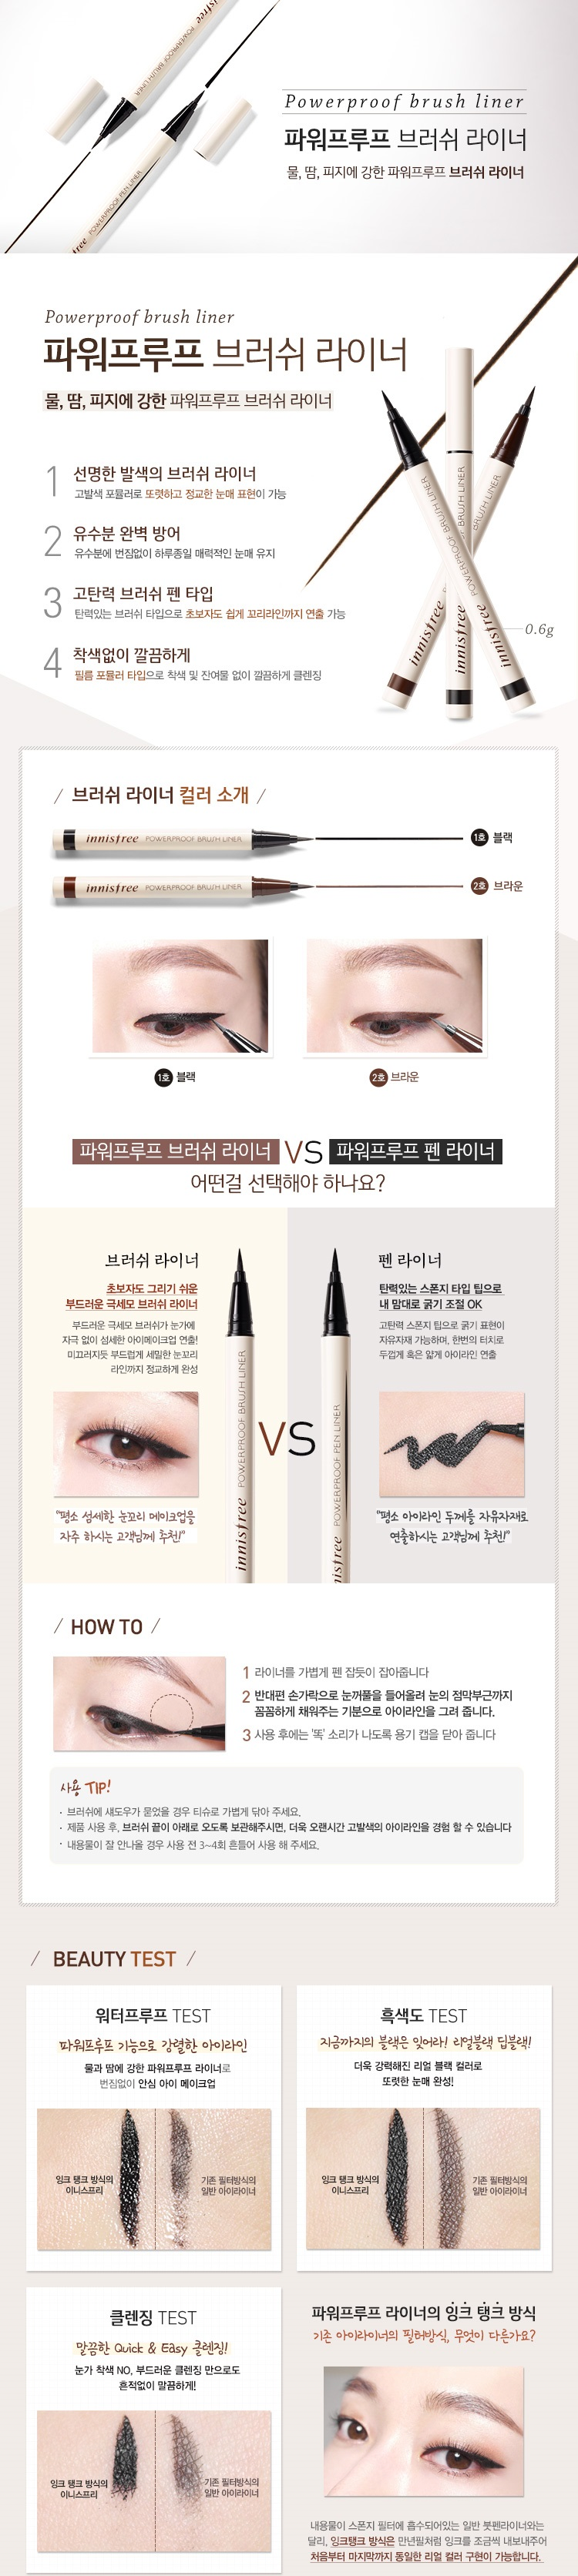 Kẻ mắt không trôi Innisfree Powerproof Brush Liner